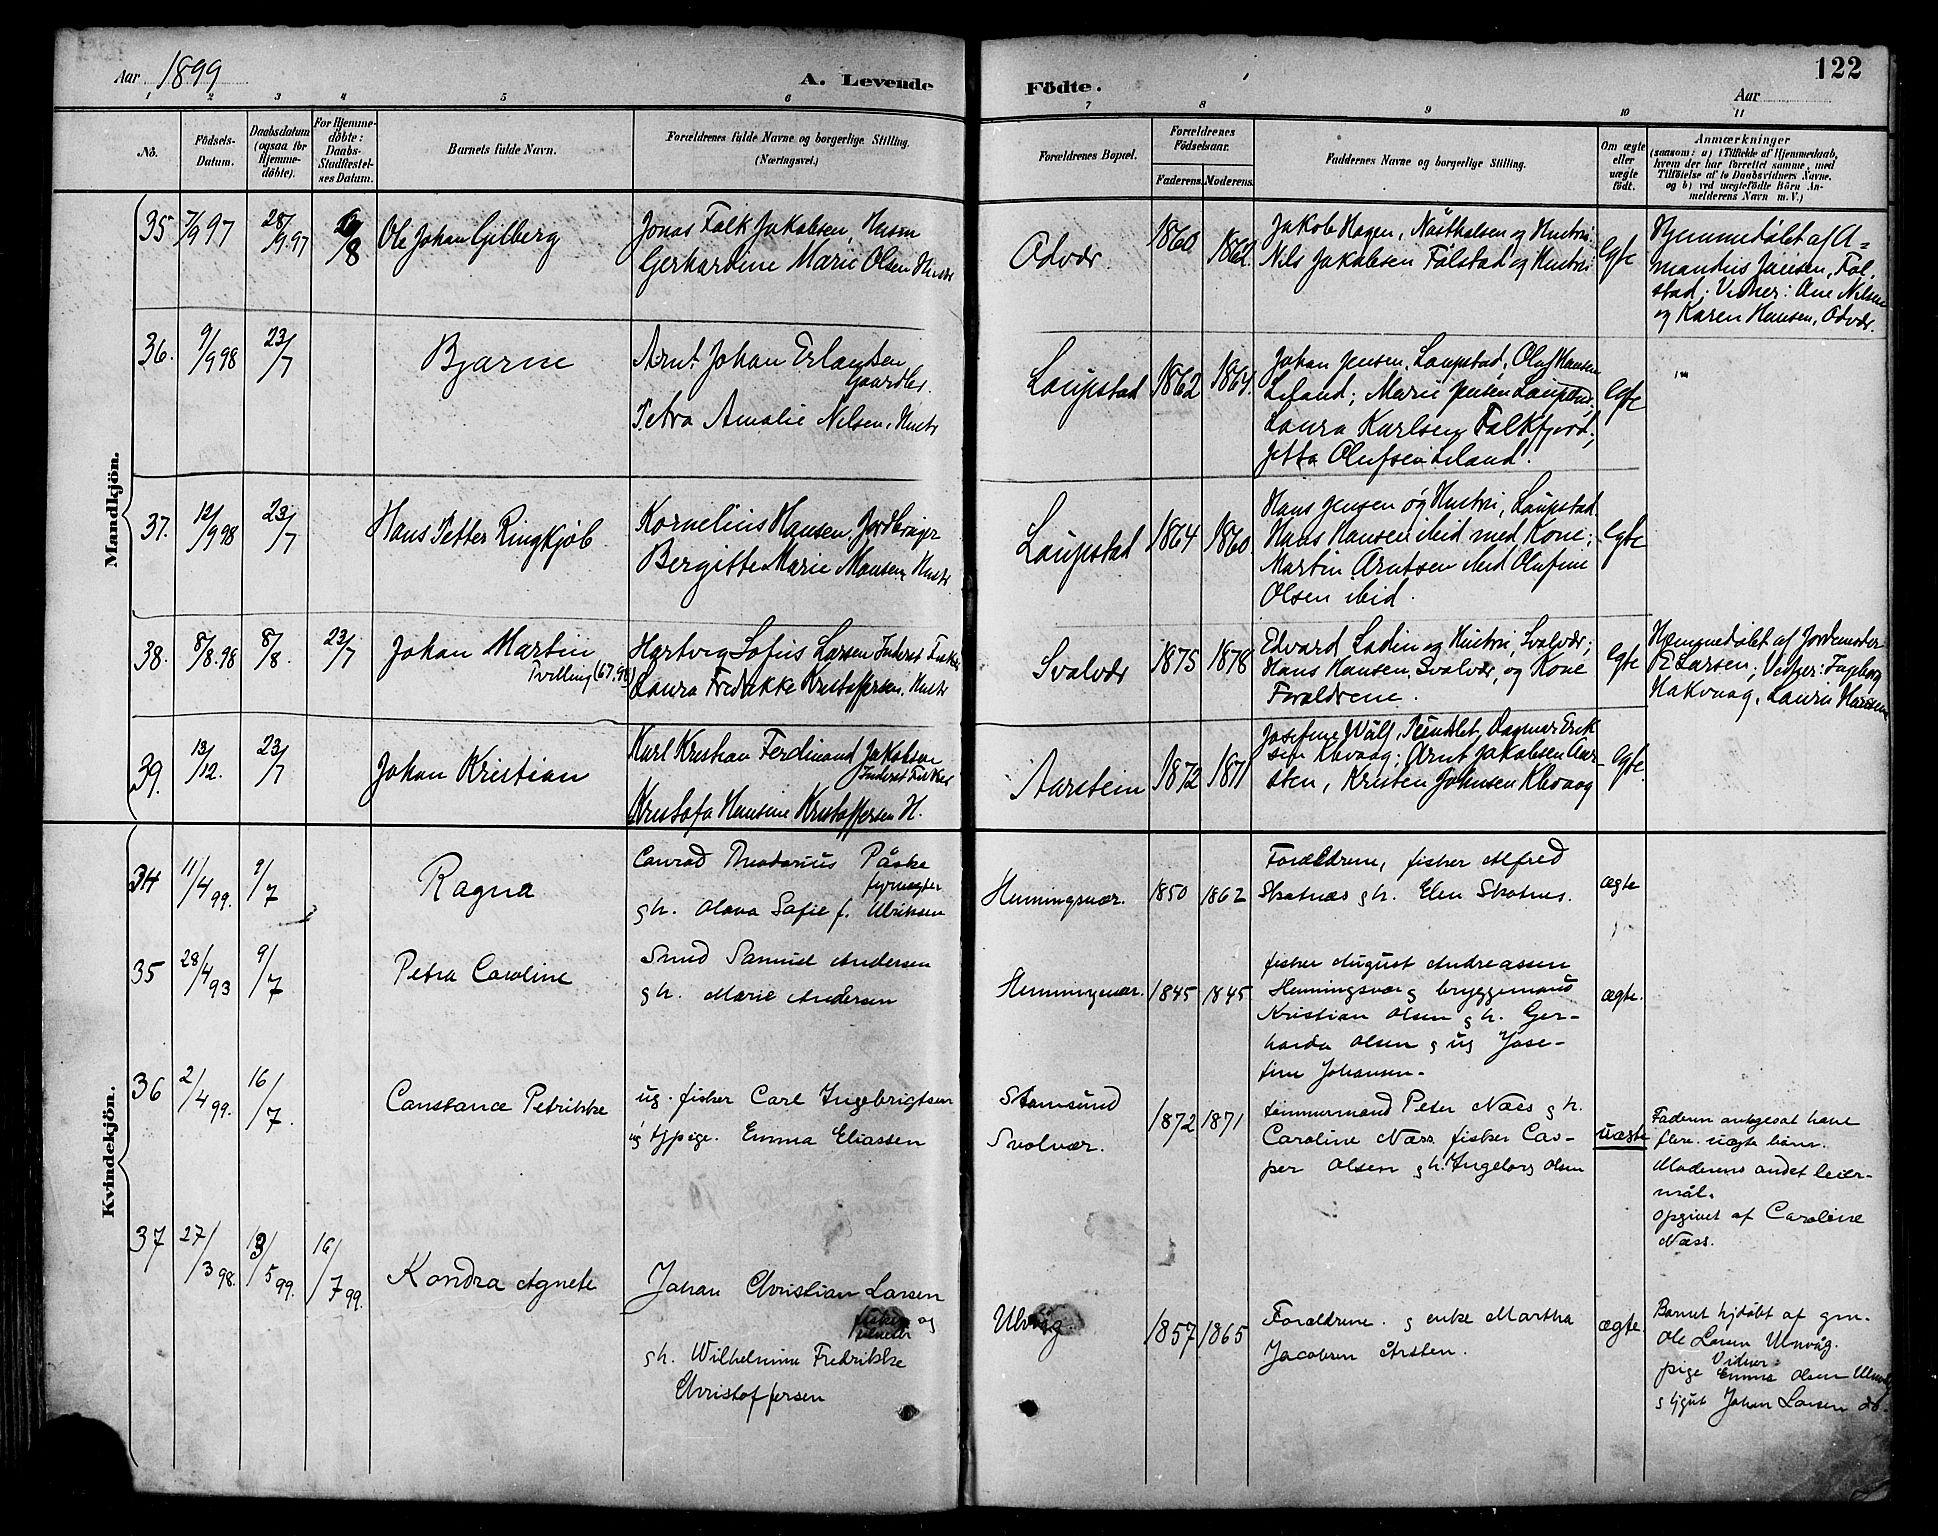 SAT, Ministerialprotokoller, klokkerbøker og fødselsregistre - Nordland, 874/L1060: Ministerialbok nr. 874A04, 1890-1899, s. 122